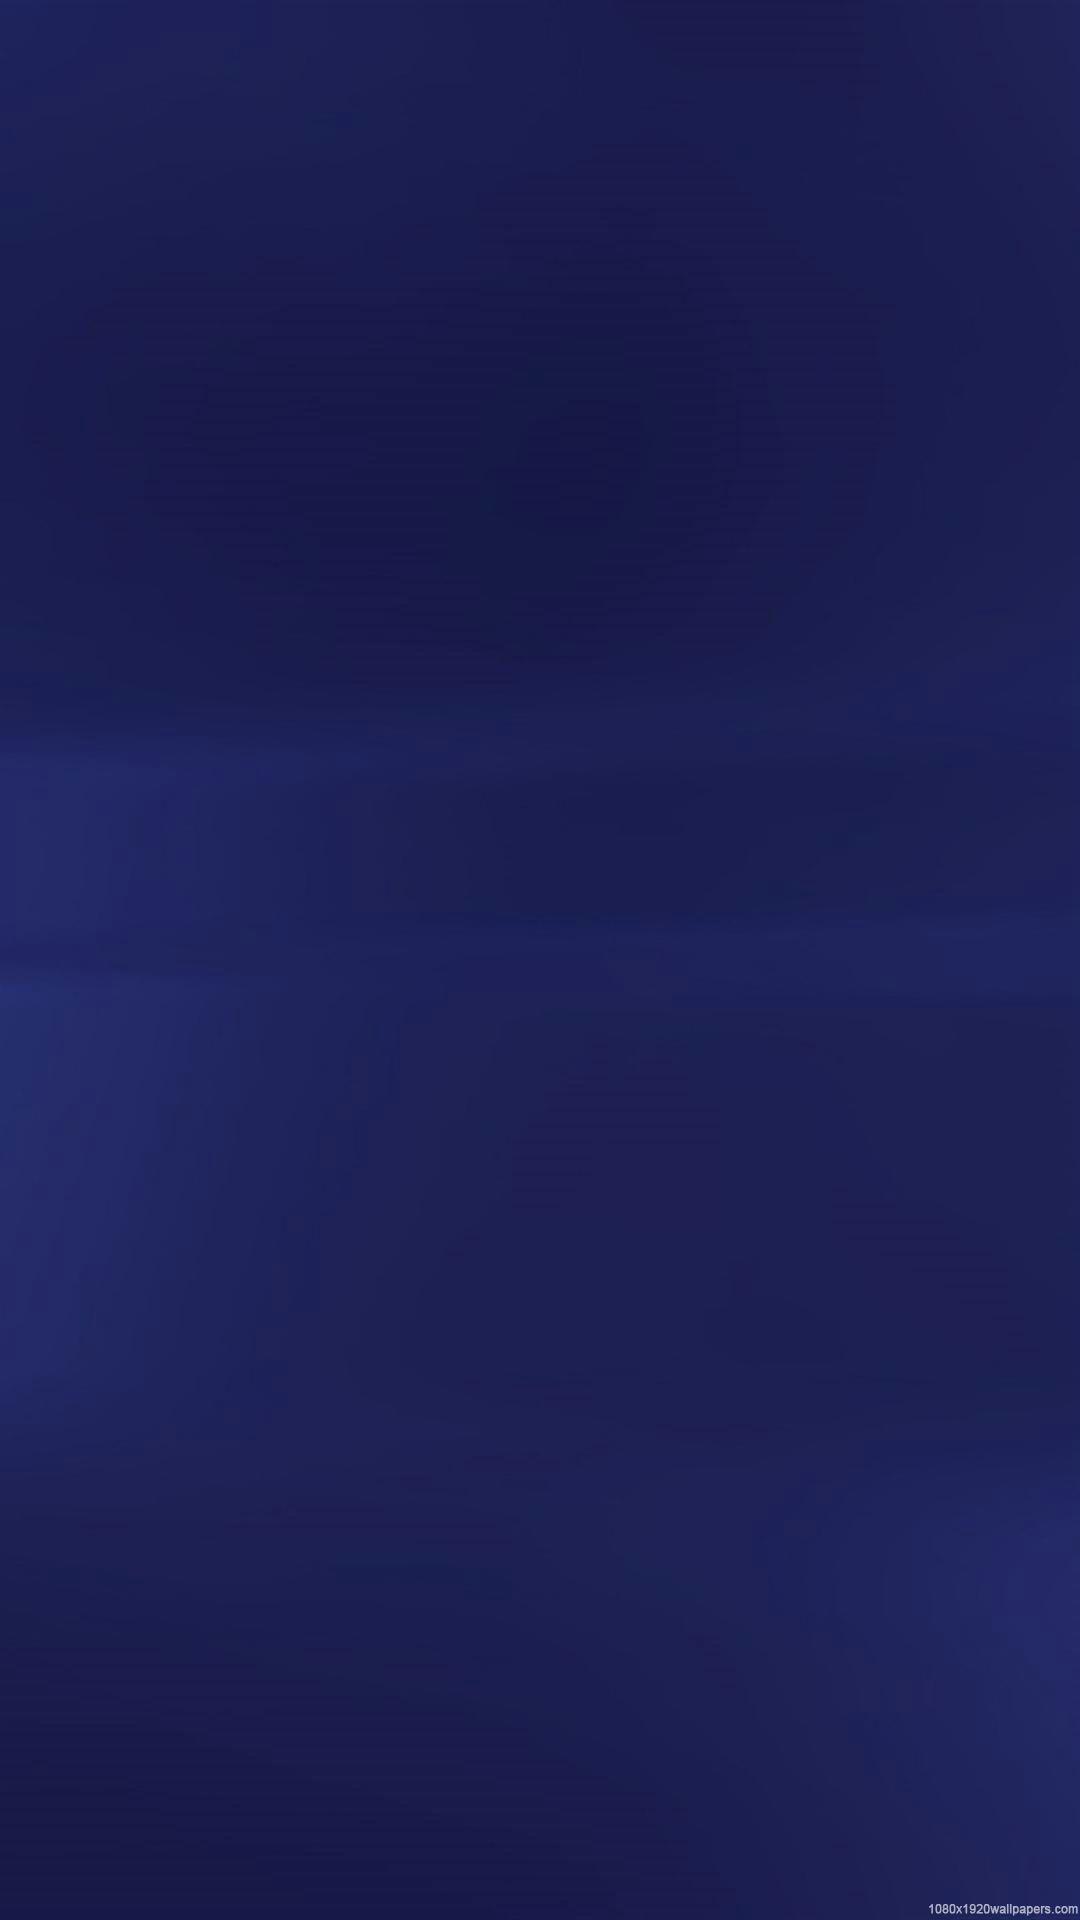 Dark Blue HD Wallpapers - Wallpaper Cave